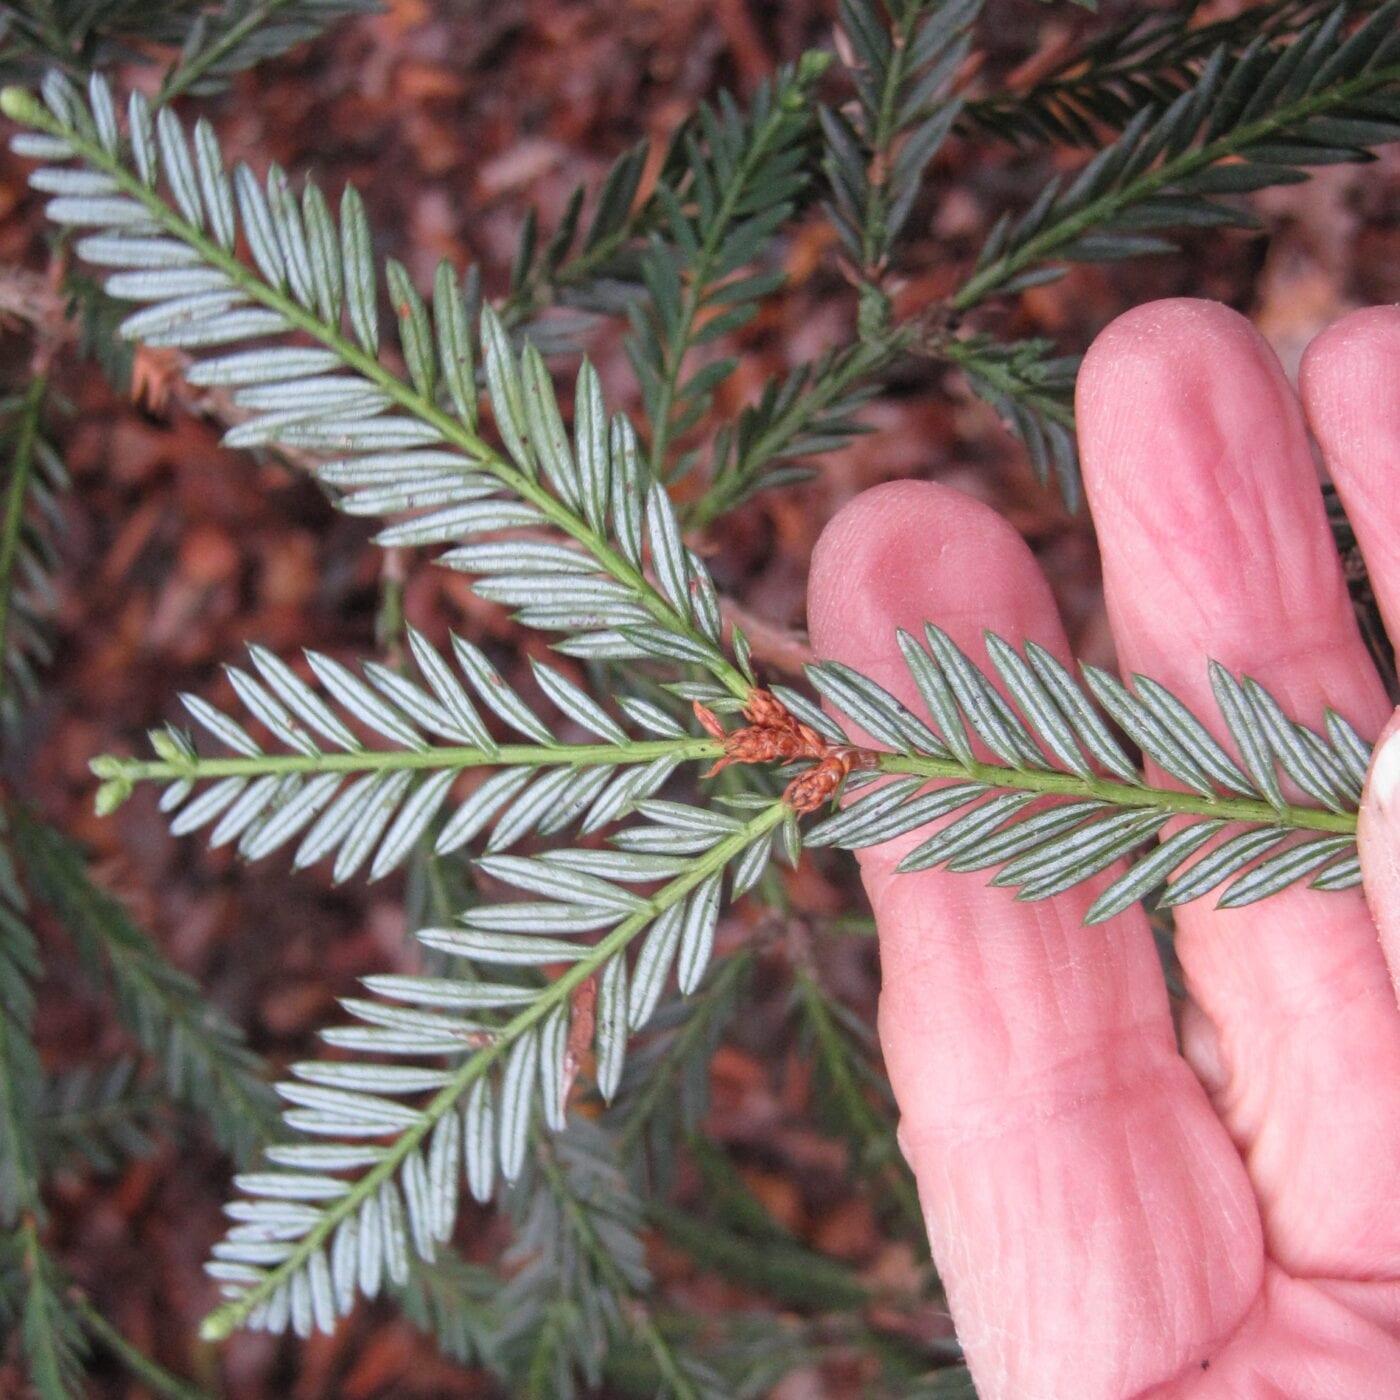 Coast Redwood needles